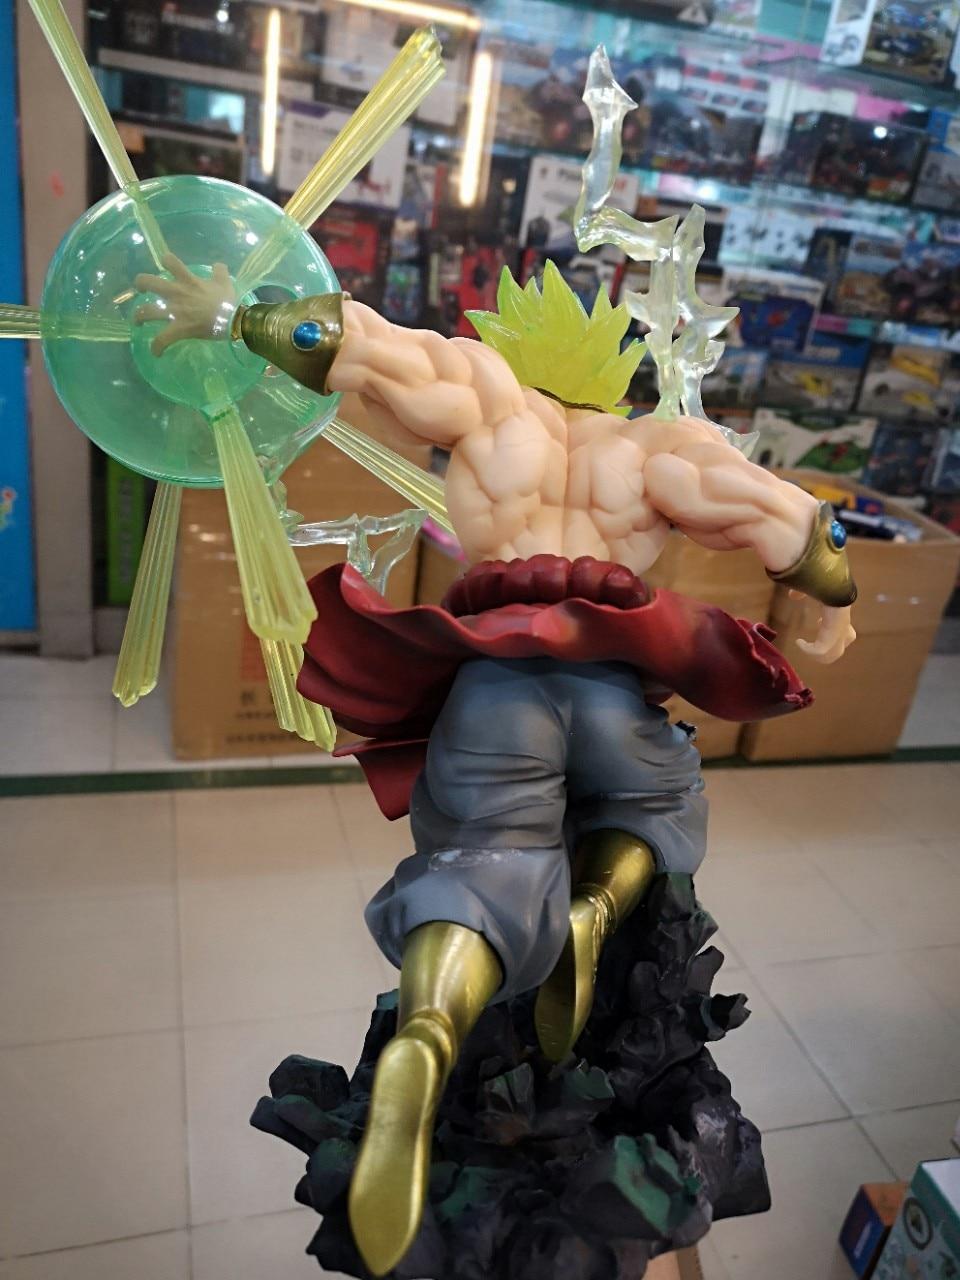 Новые горячие Dragon Ball Z фигурка F. ZERO Супер Saiyan Broli фигурку Broly ПВХ 32 см - 3